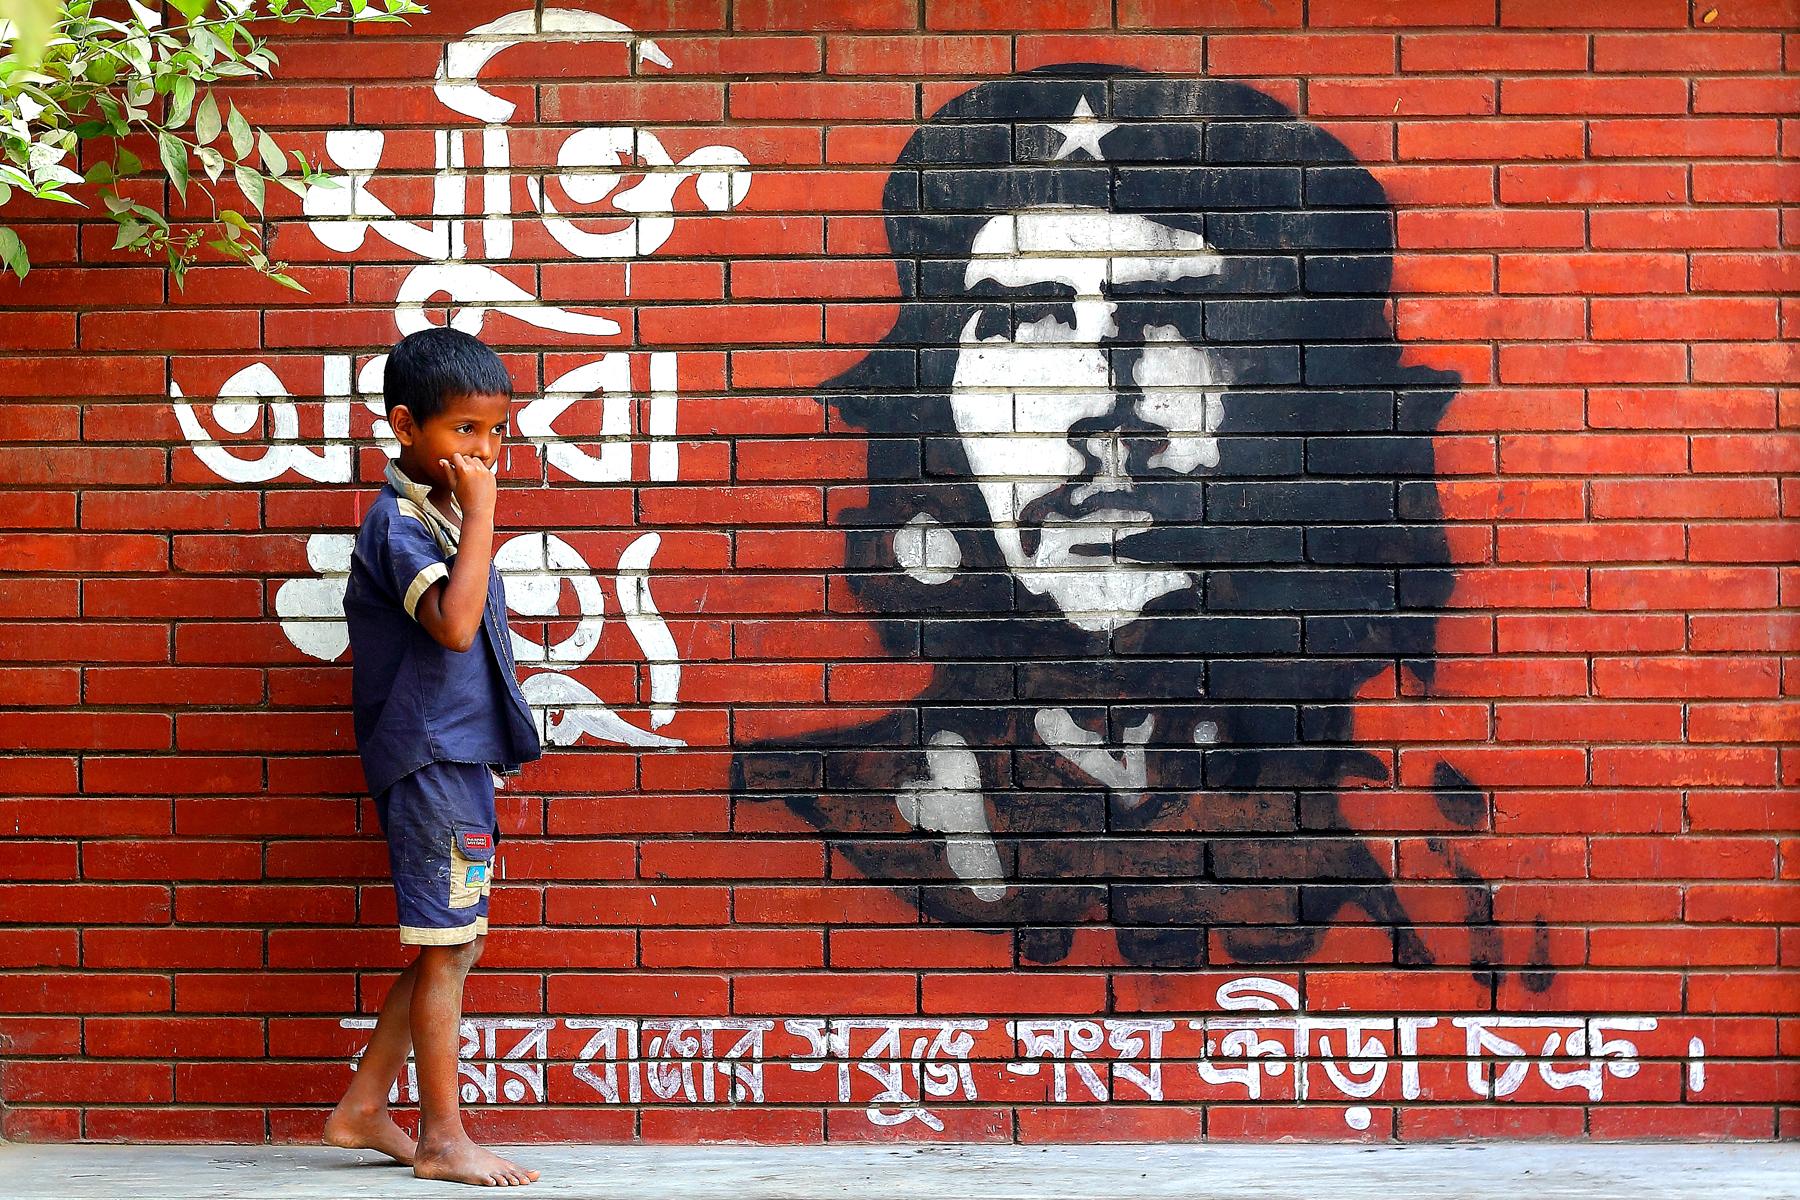 Wall_paint,_Dhaka,_Bangladesh.jpg (1800×1200)